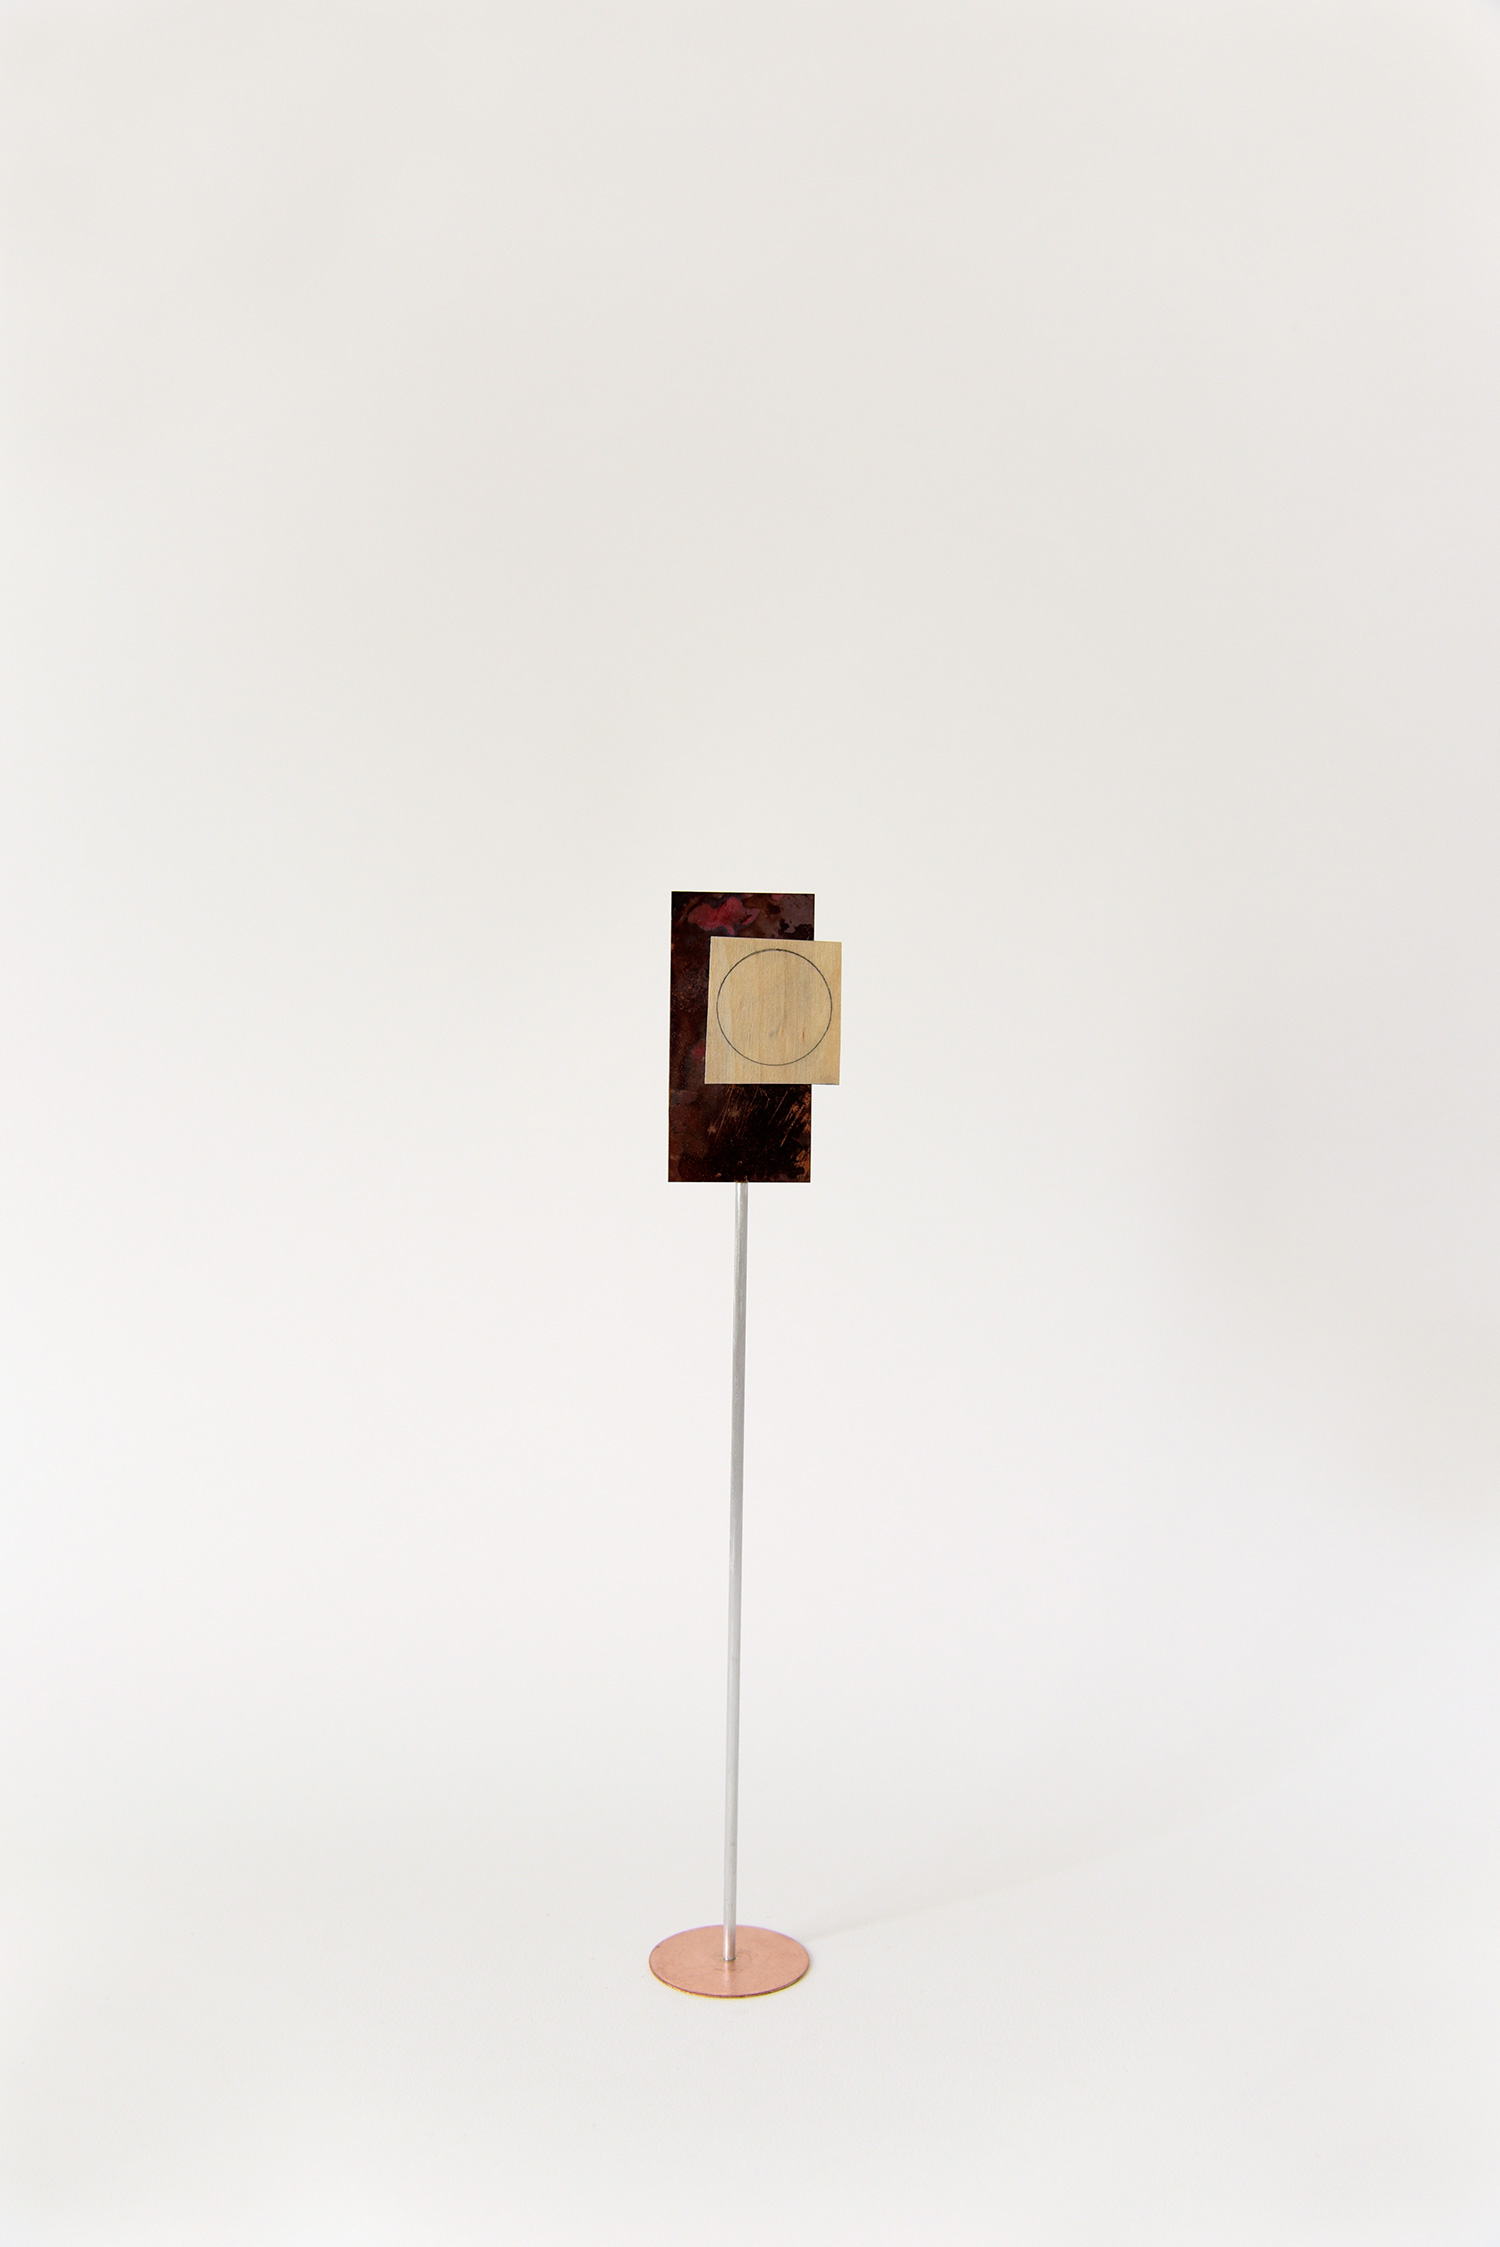 Hardbody Sculpture (Object) III